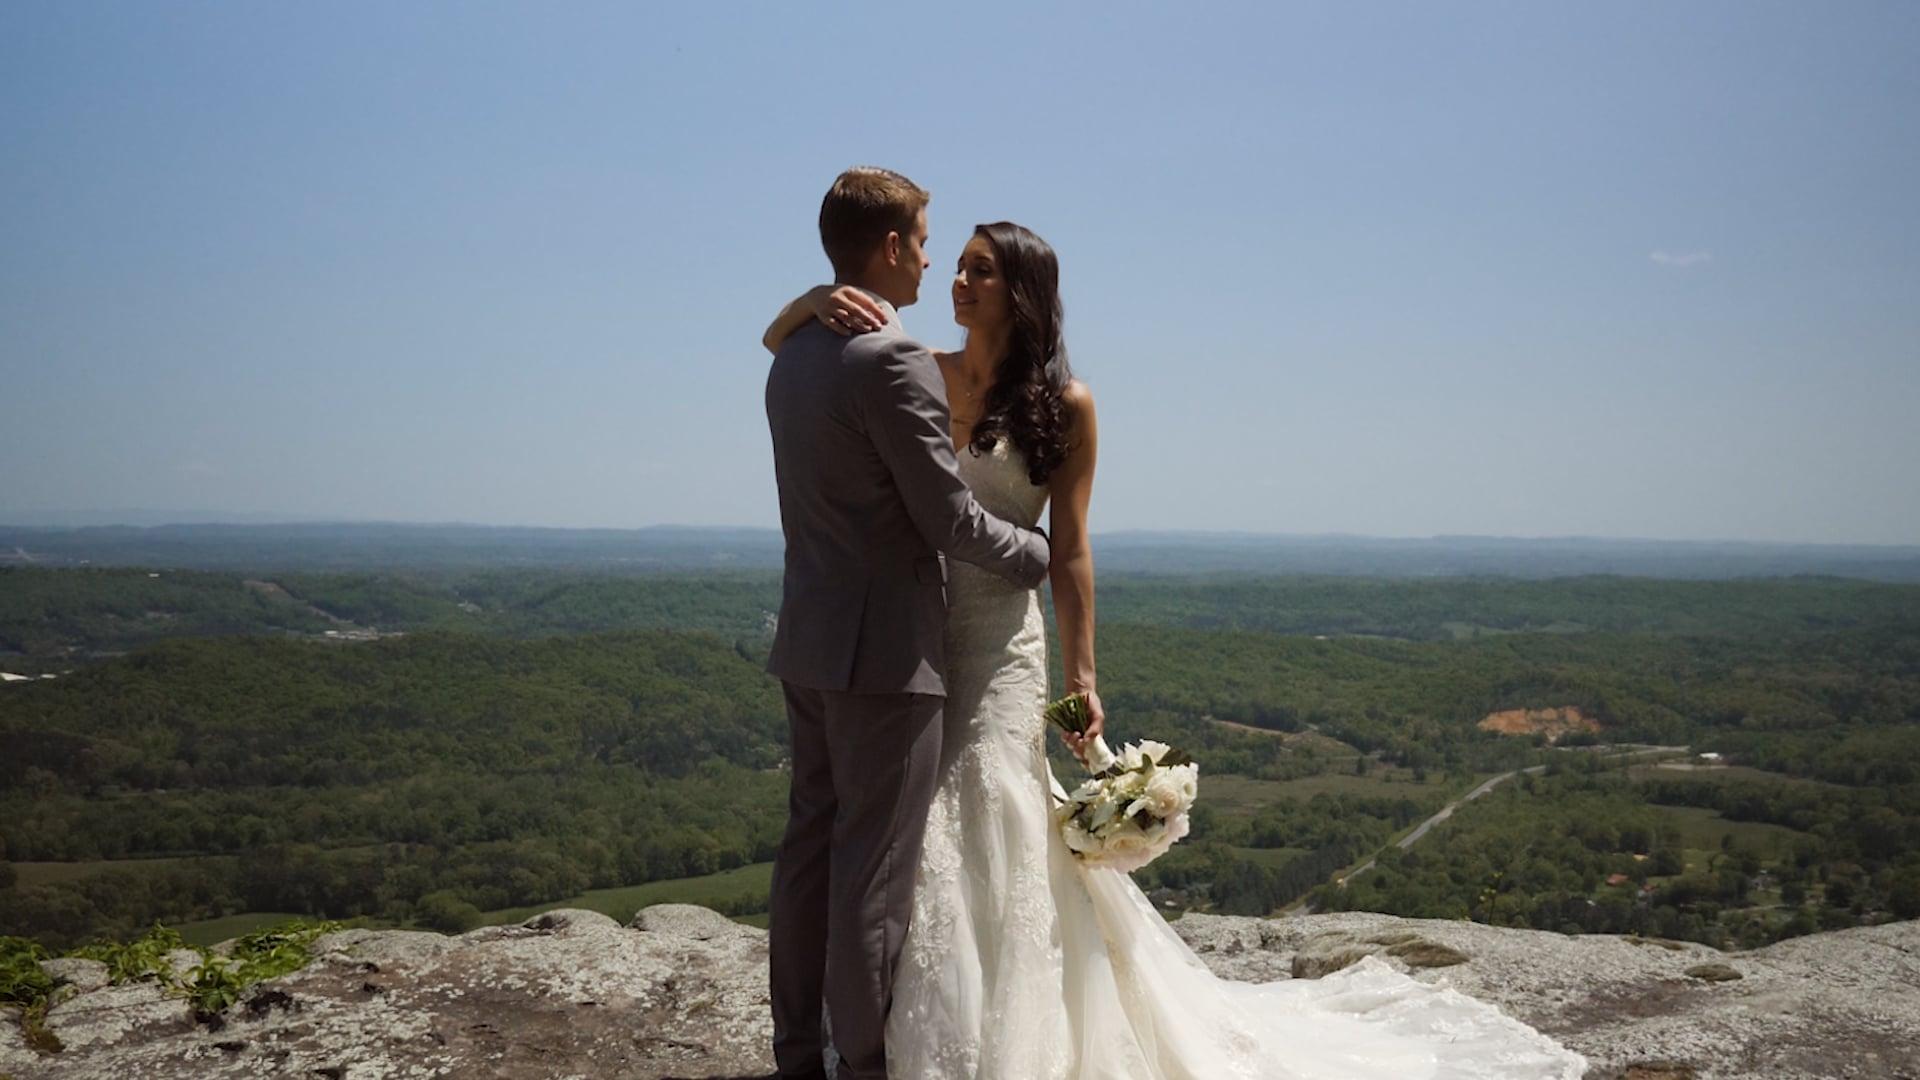 Austin & Emily Wedding Highlight   Grandview, Lookout Mountain, GA